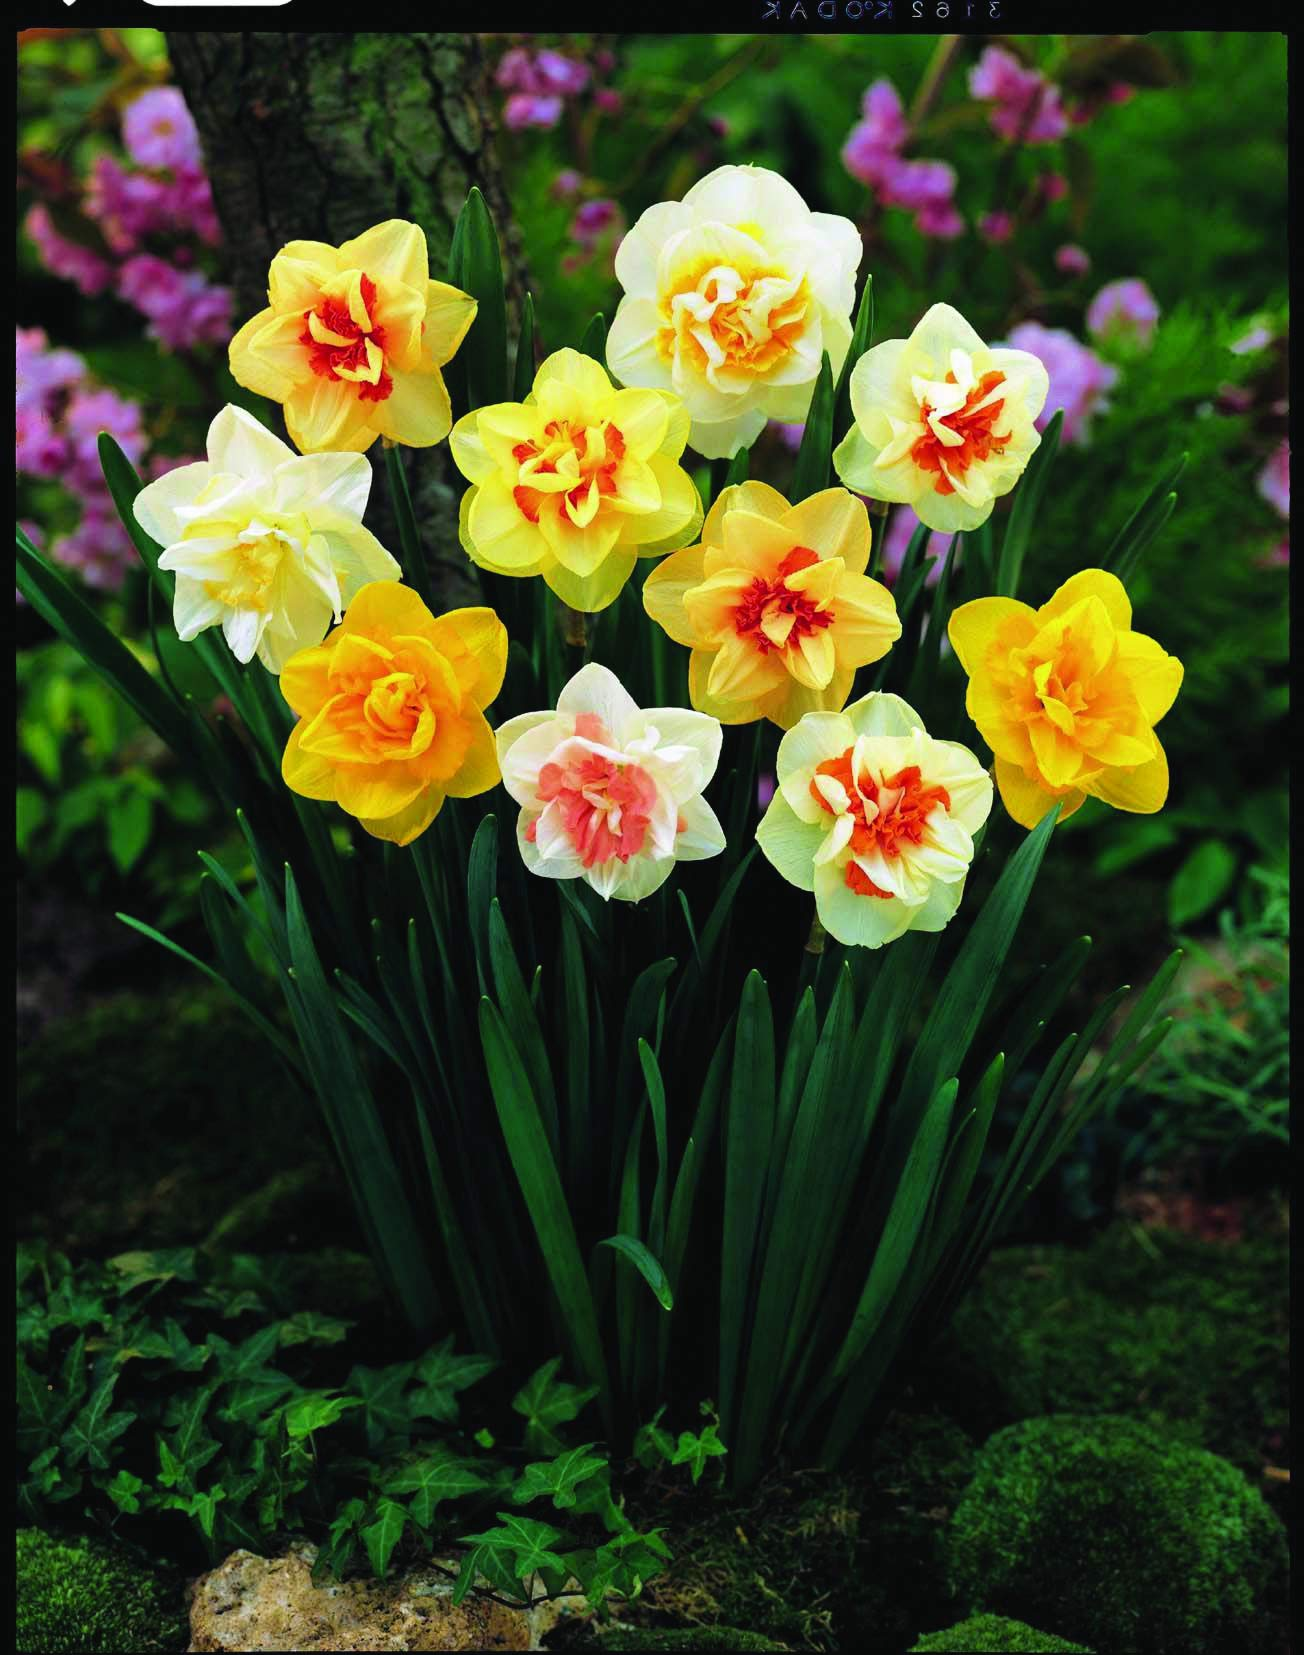 Burpee's Double Mix Daffodil - 12 Flower Bulbs   Multiple Colors   14 - 16cm Bulb Diameter